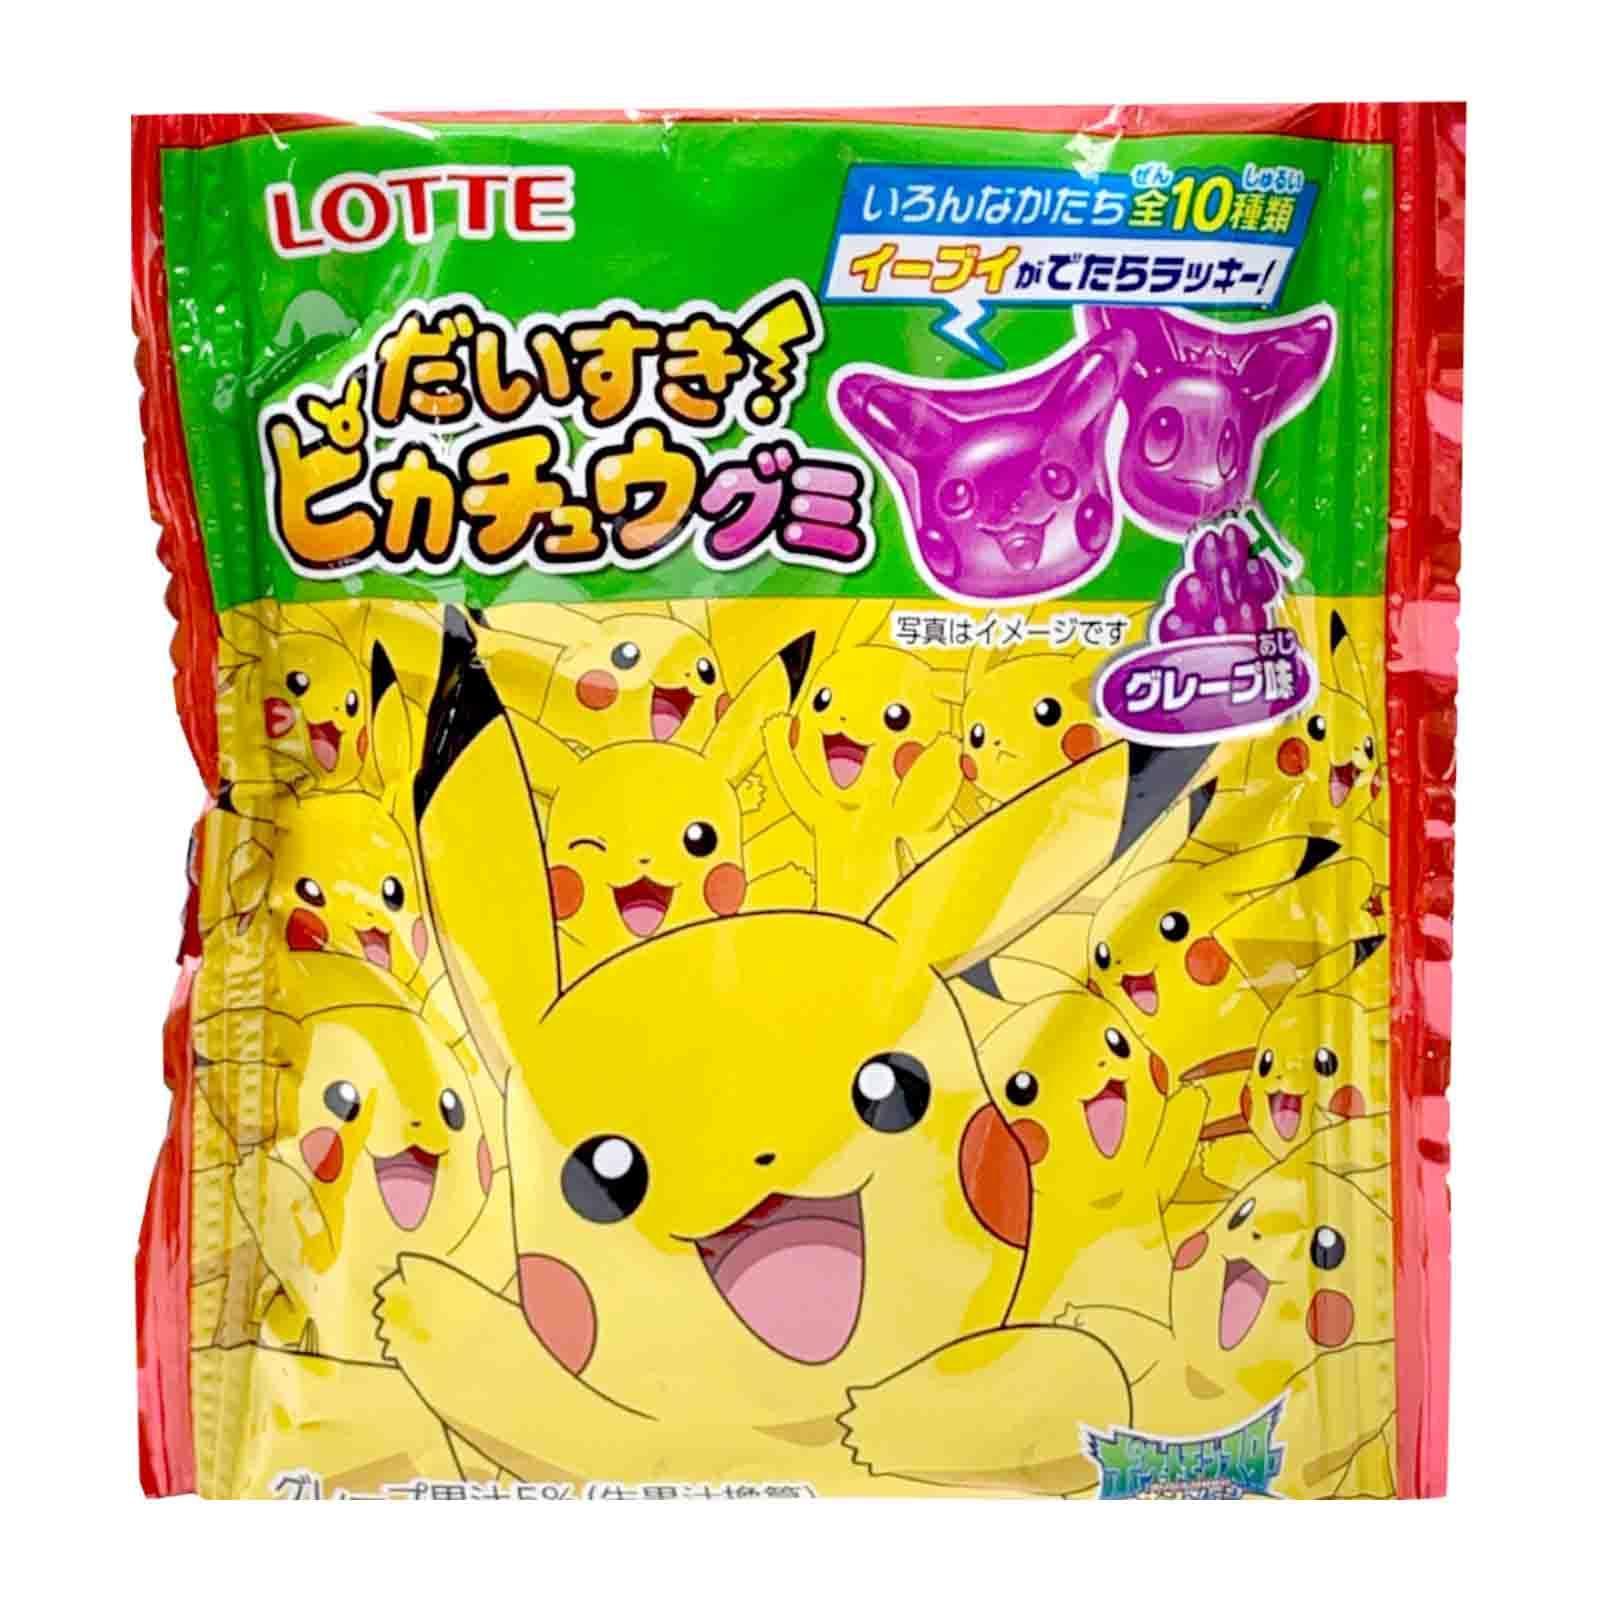 Lotte Pikachu Shaped Gummy